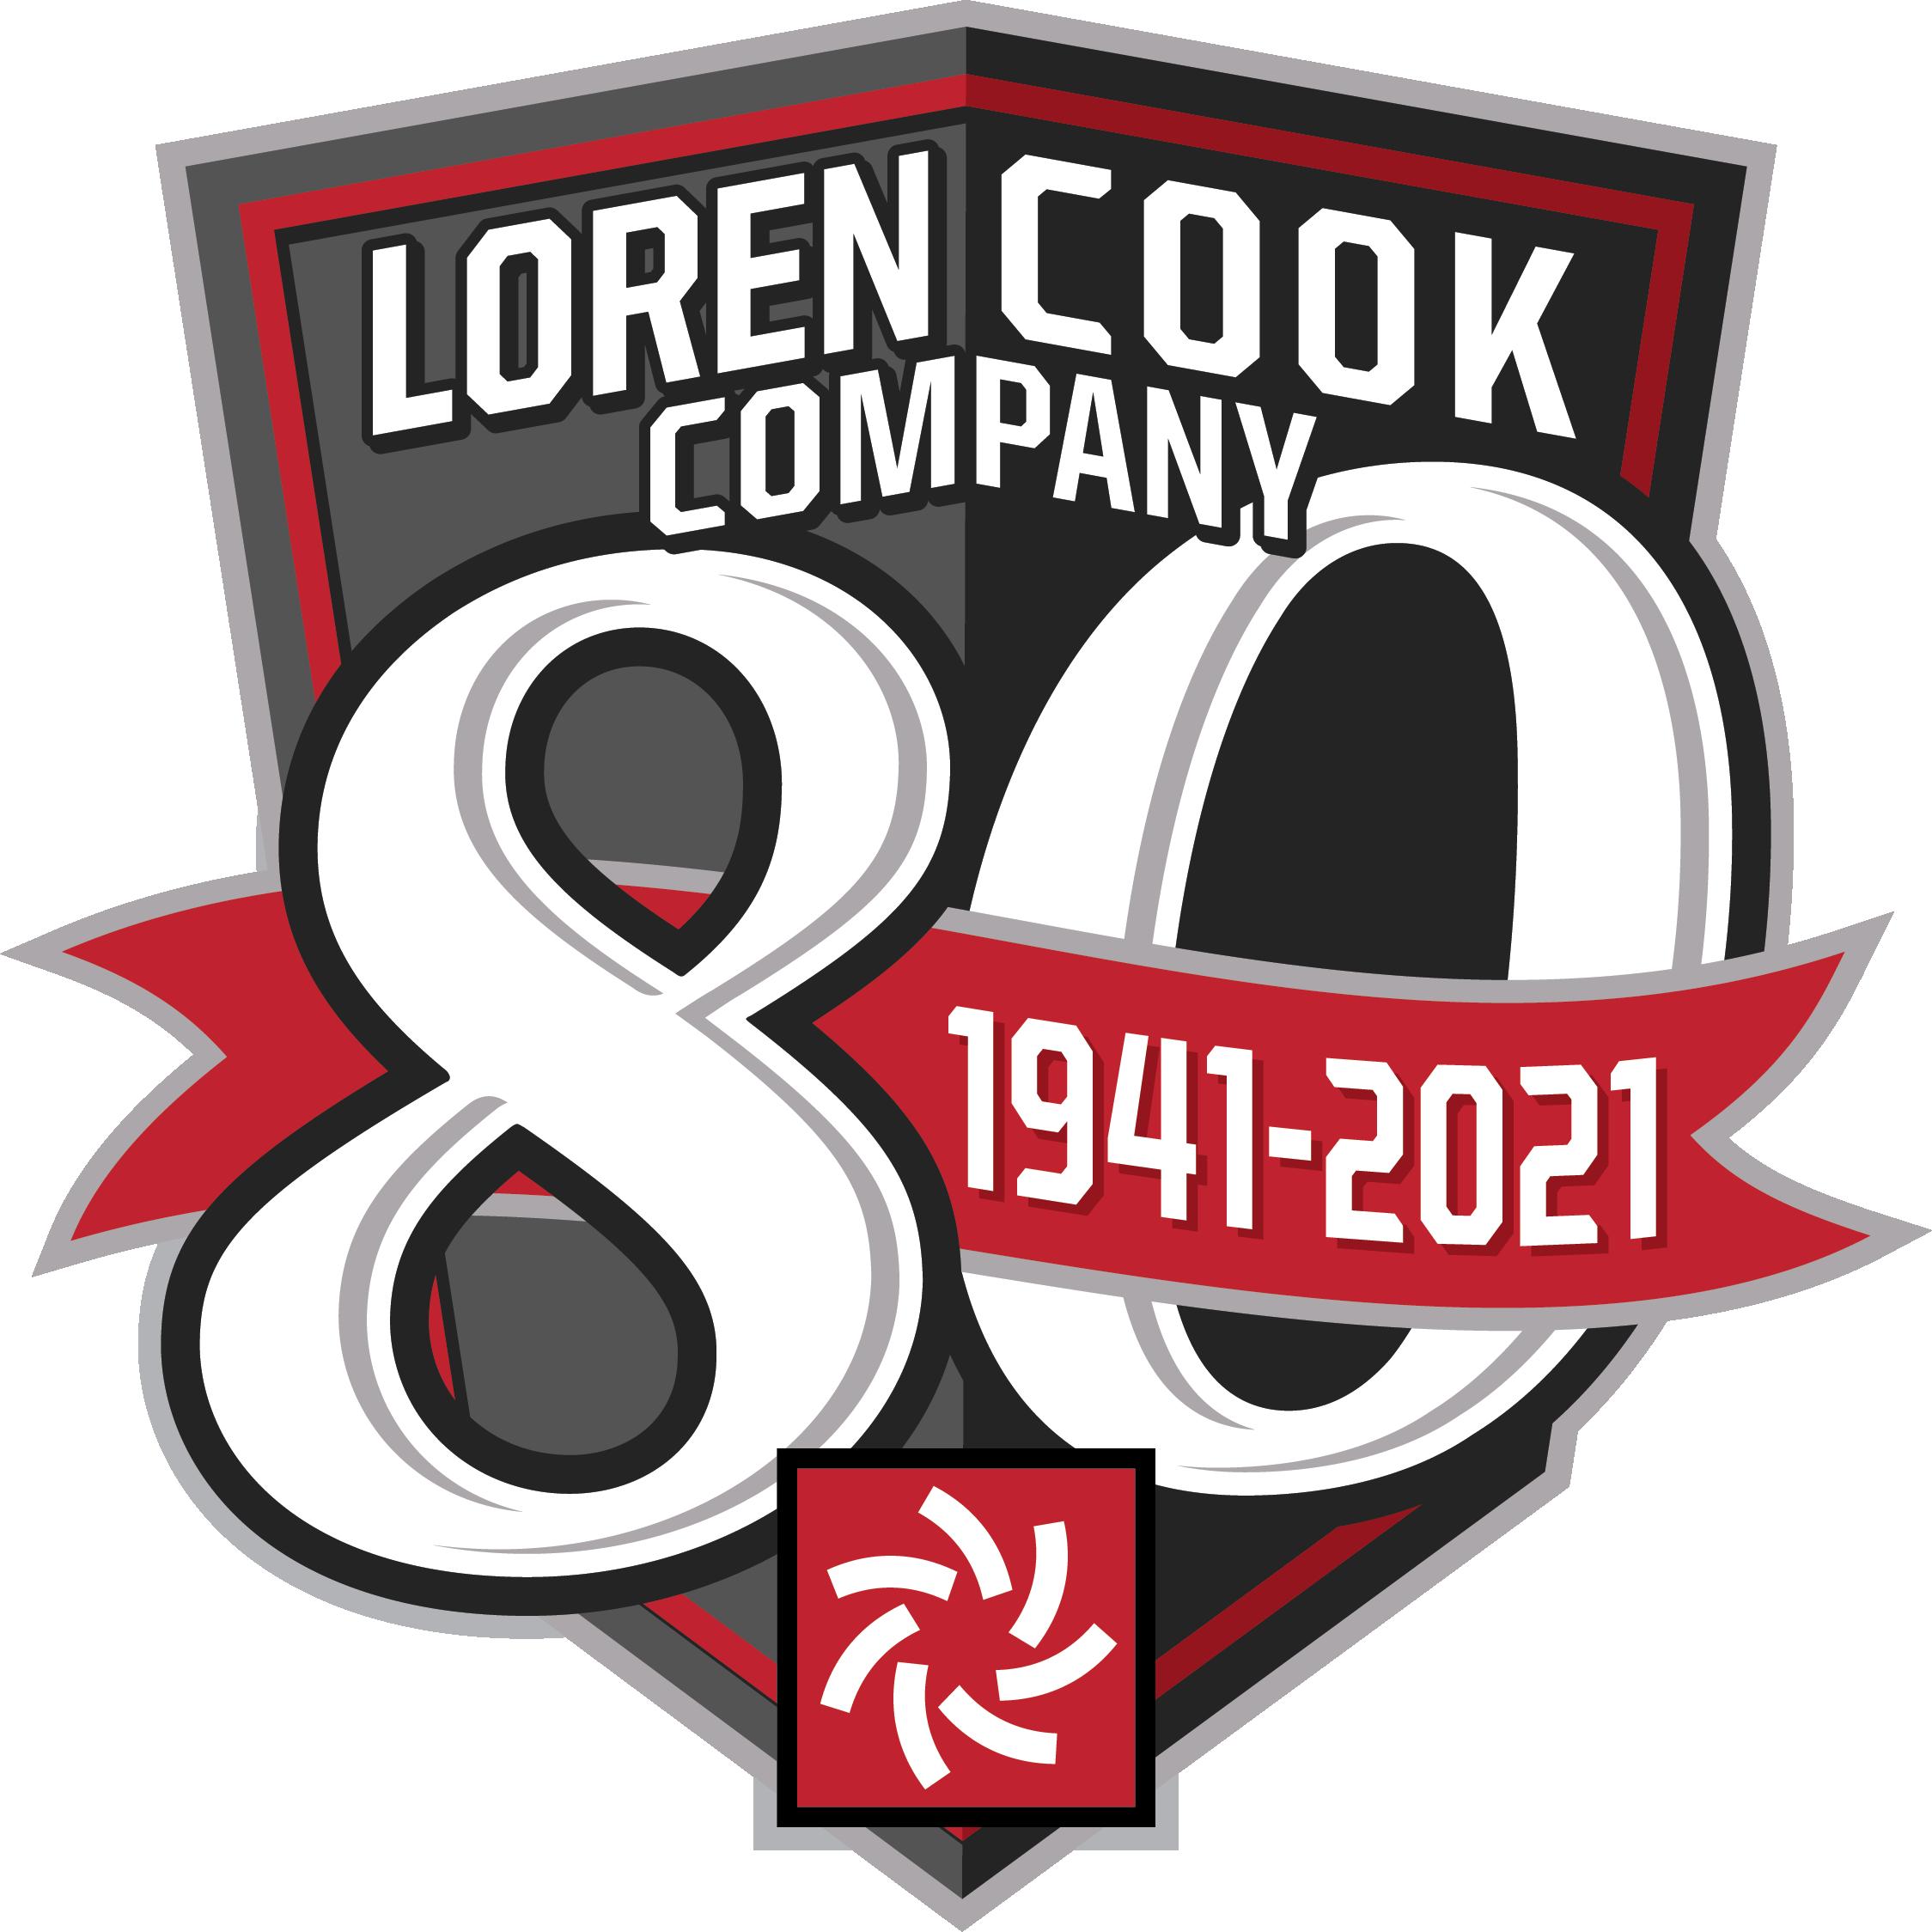 Cook 80th Anniversary Logo